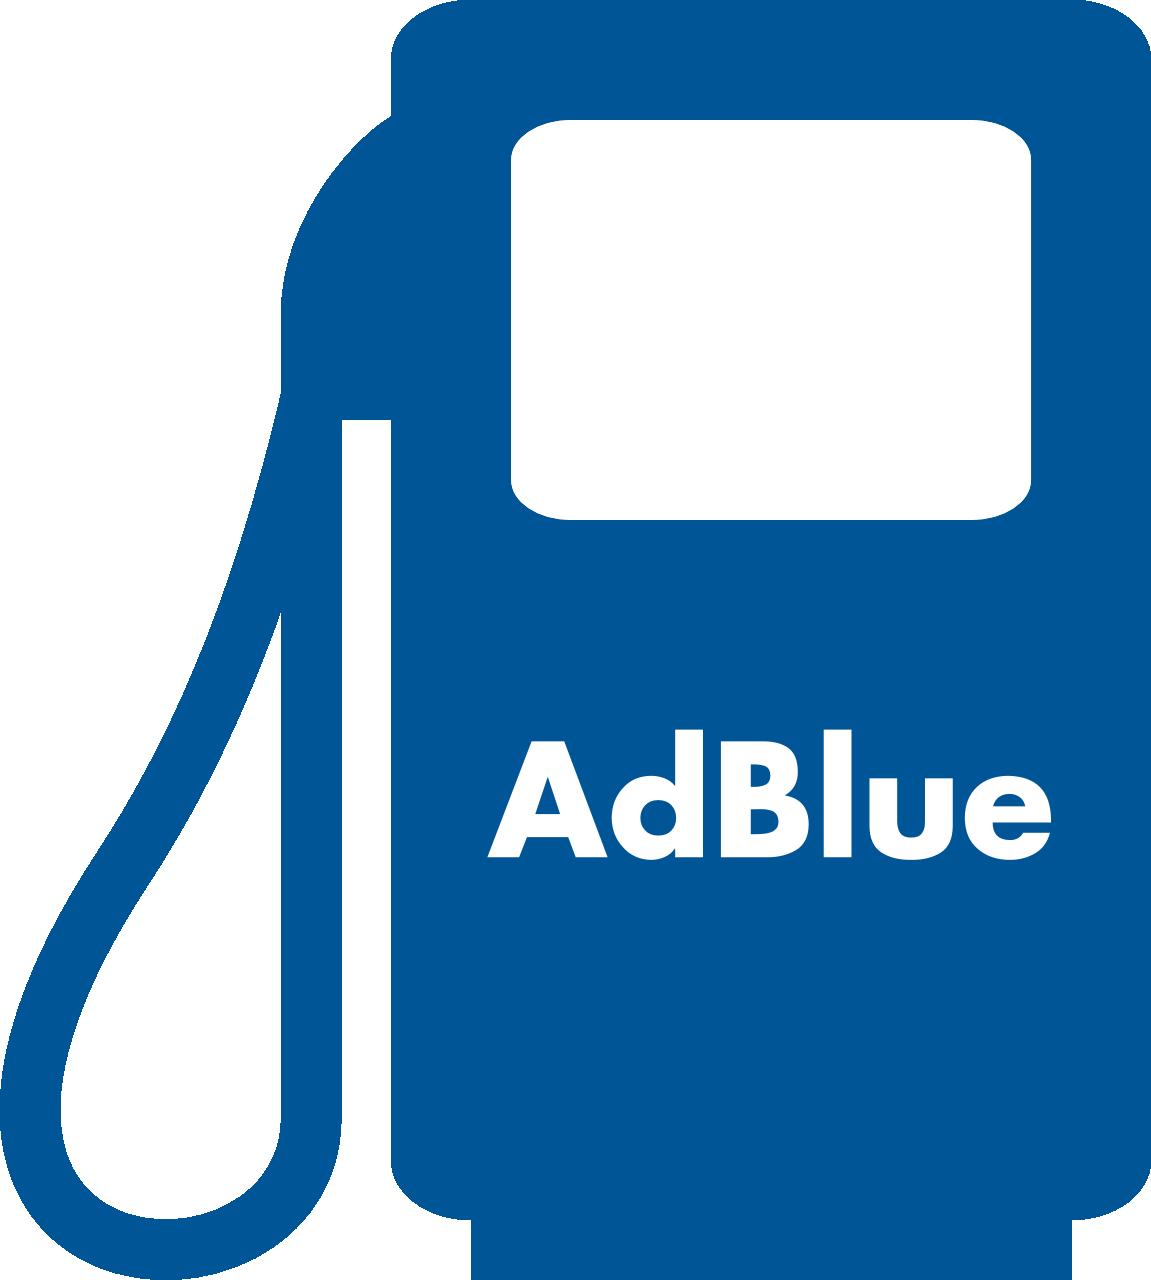 AdBlue pictogram